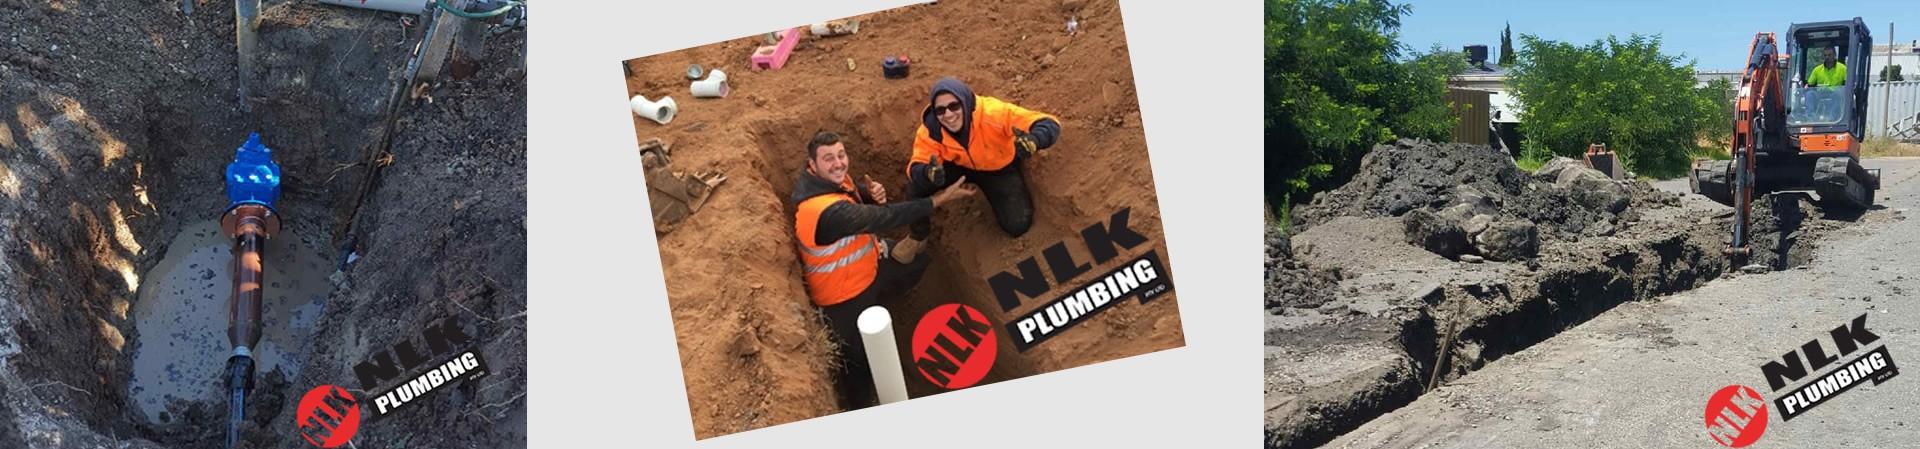 NLK Plumbing Brisbane